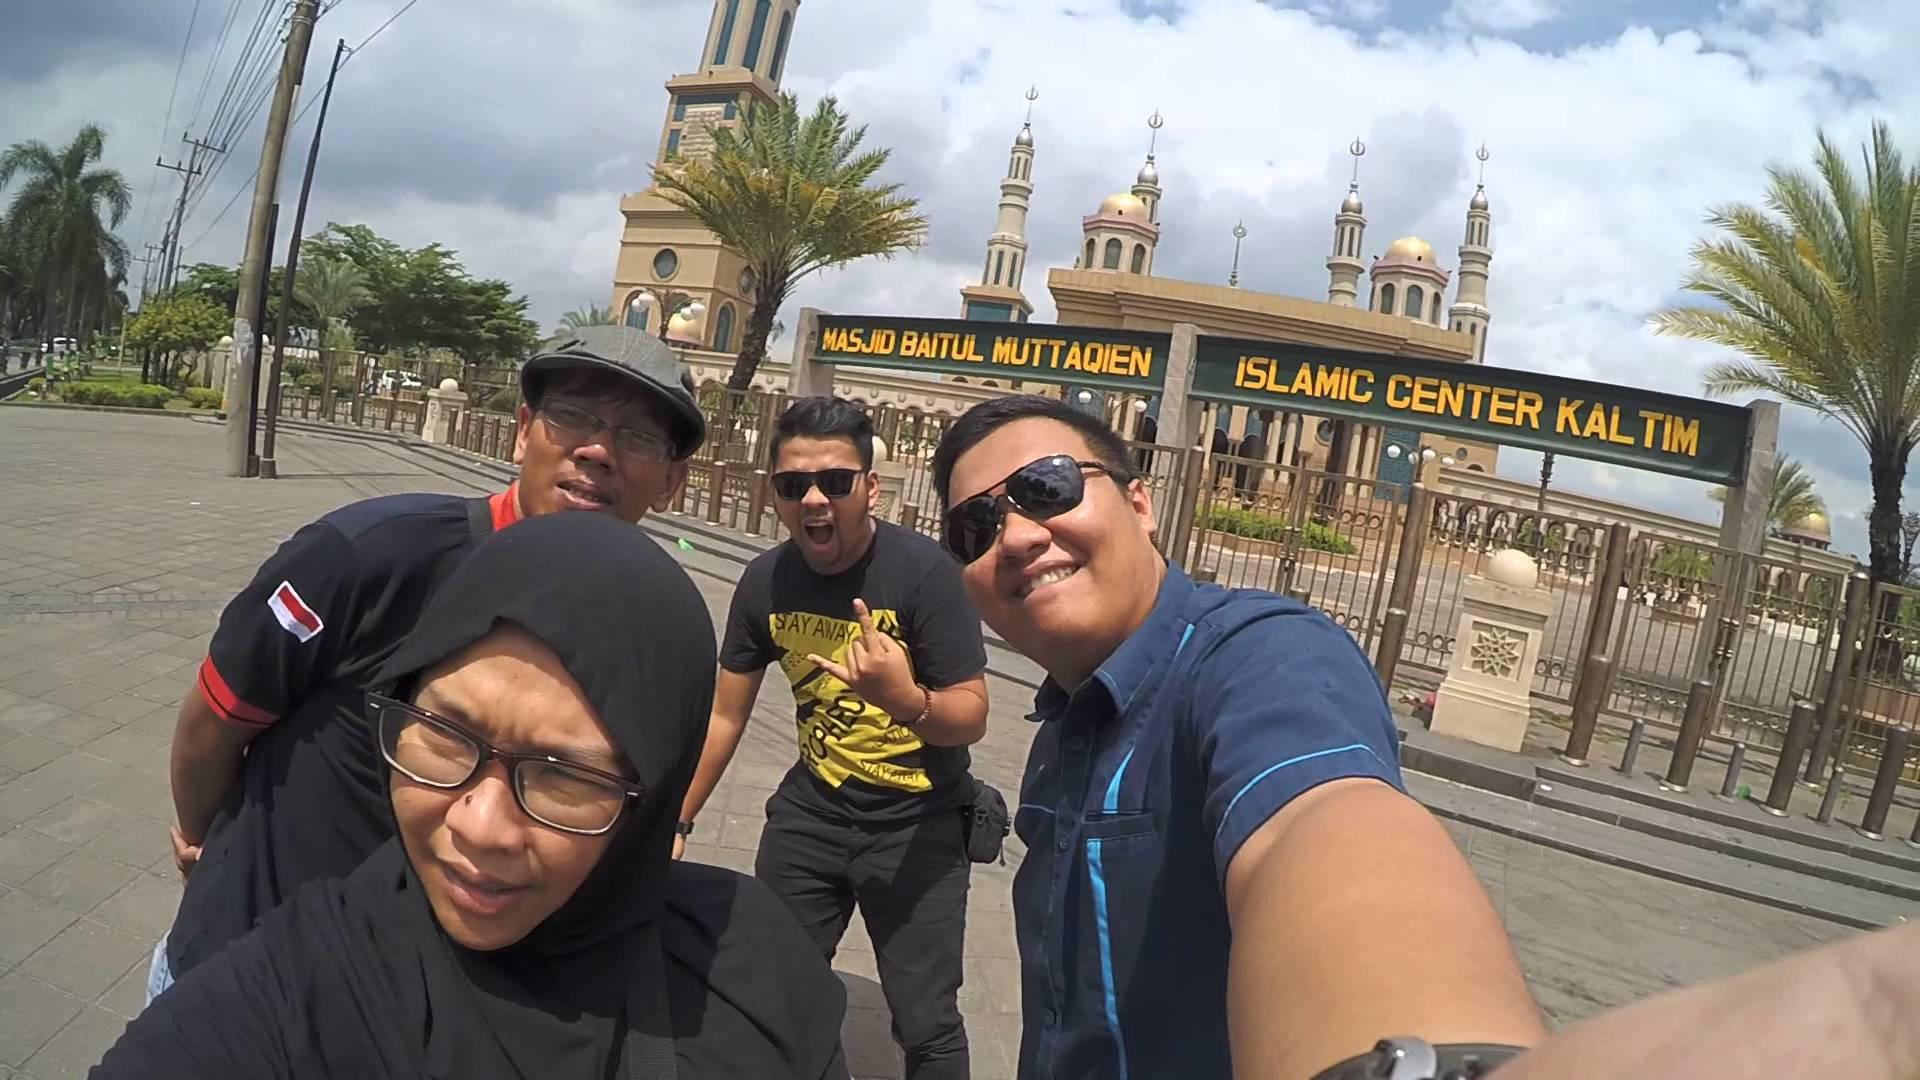 Jalan Masjid Baitul Muttaqien Islamic Center Kaltim Samarinda Kota